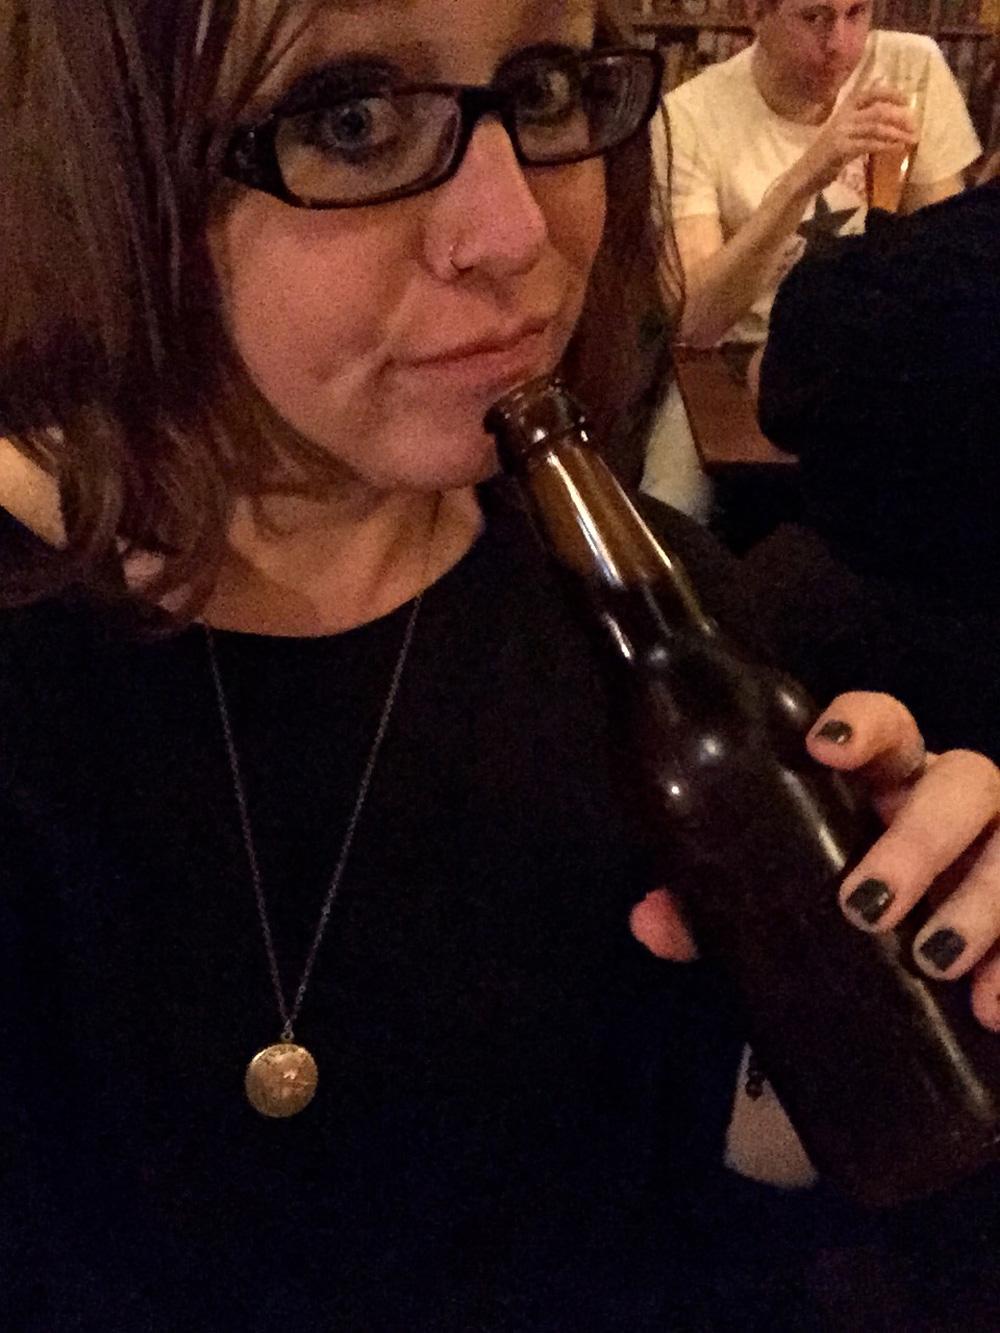 beer-me-photobomb